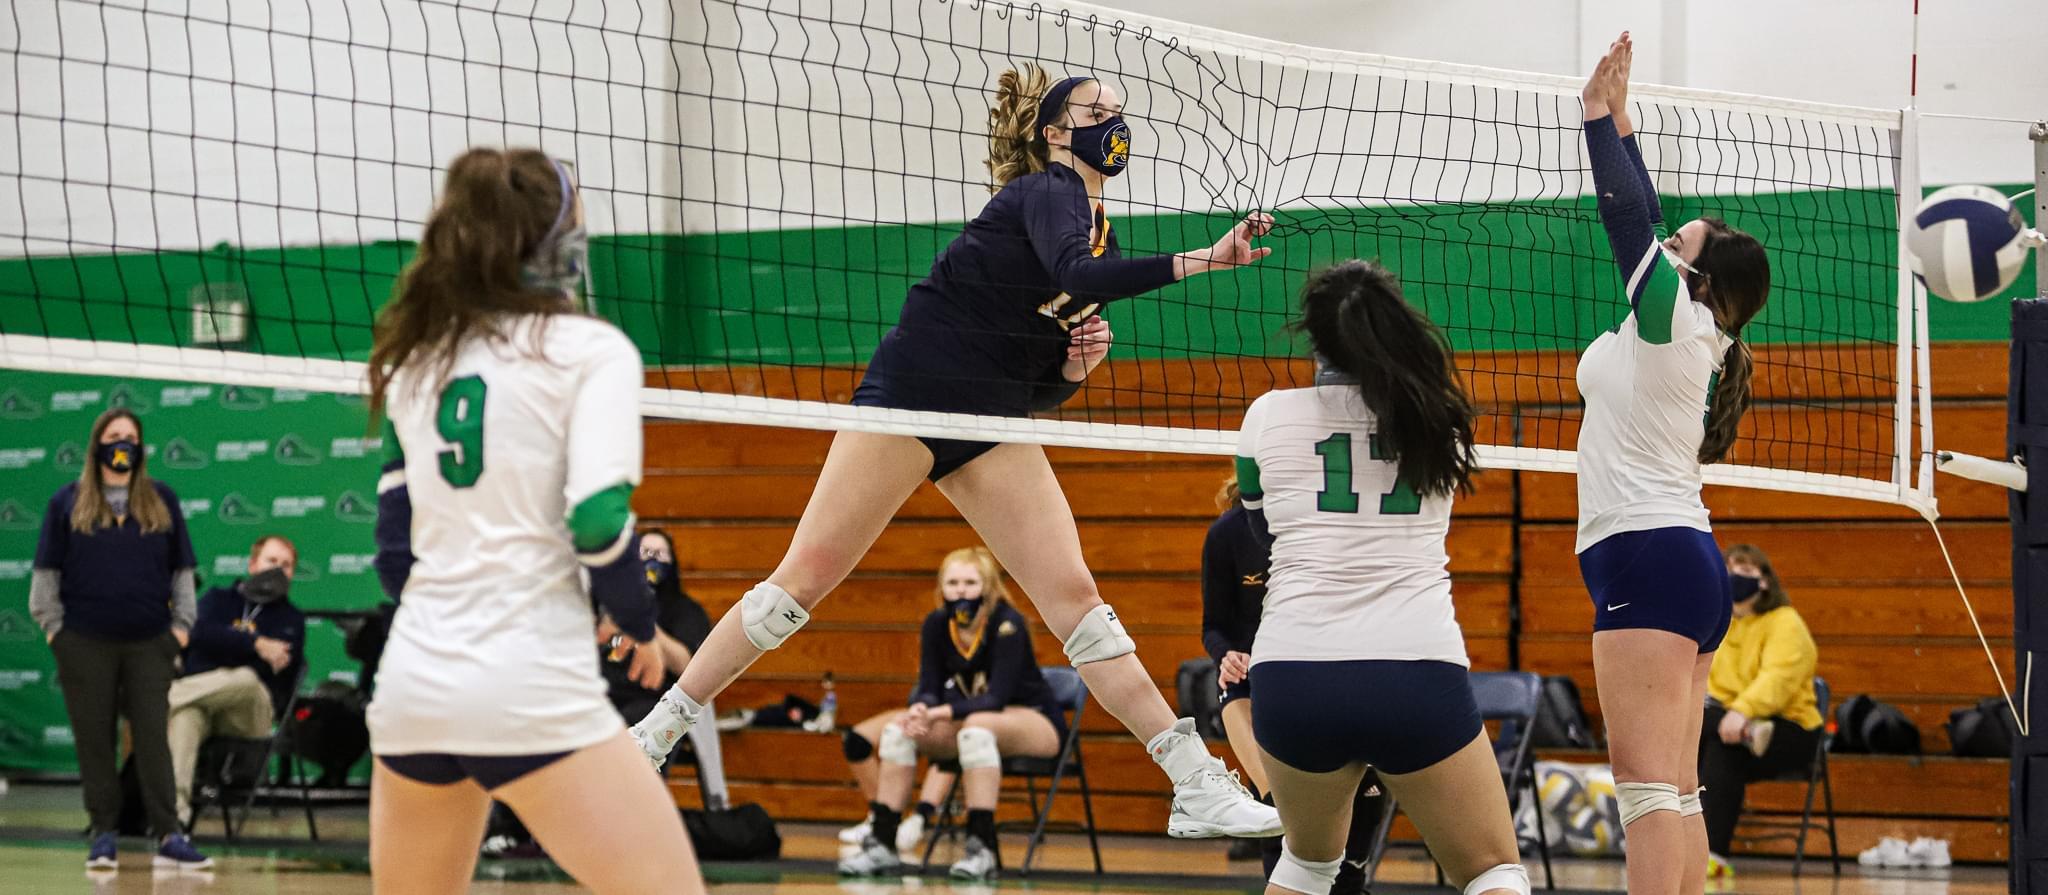 Volleyball: Goldsboro Defeats Spring Creek In Season Opener (PHOTO GALLERY)